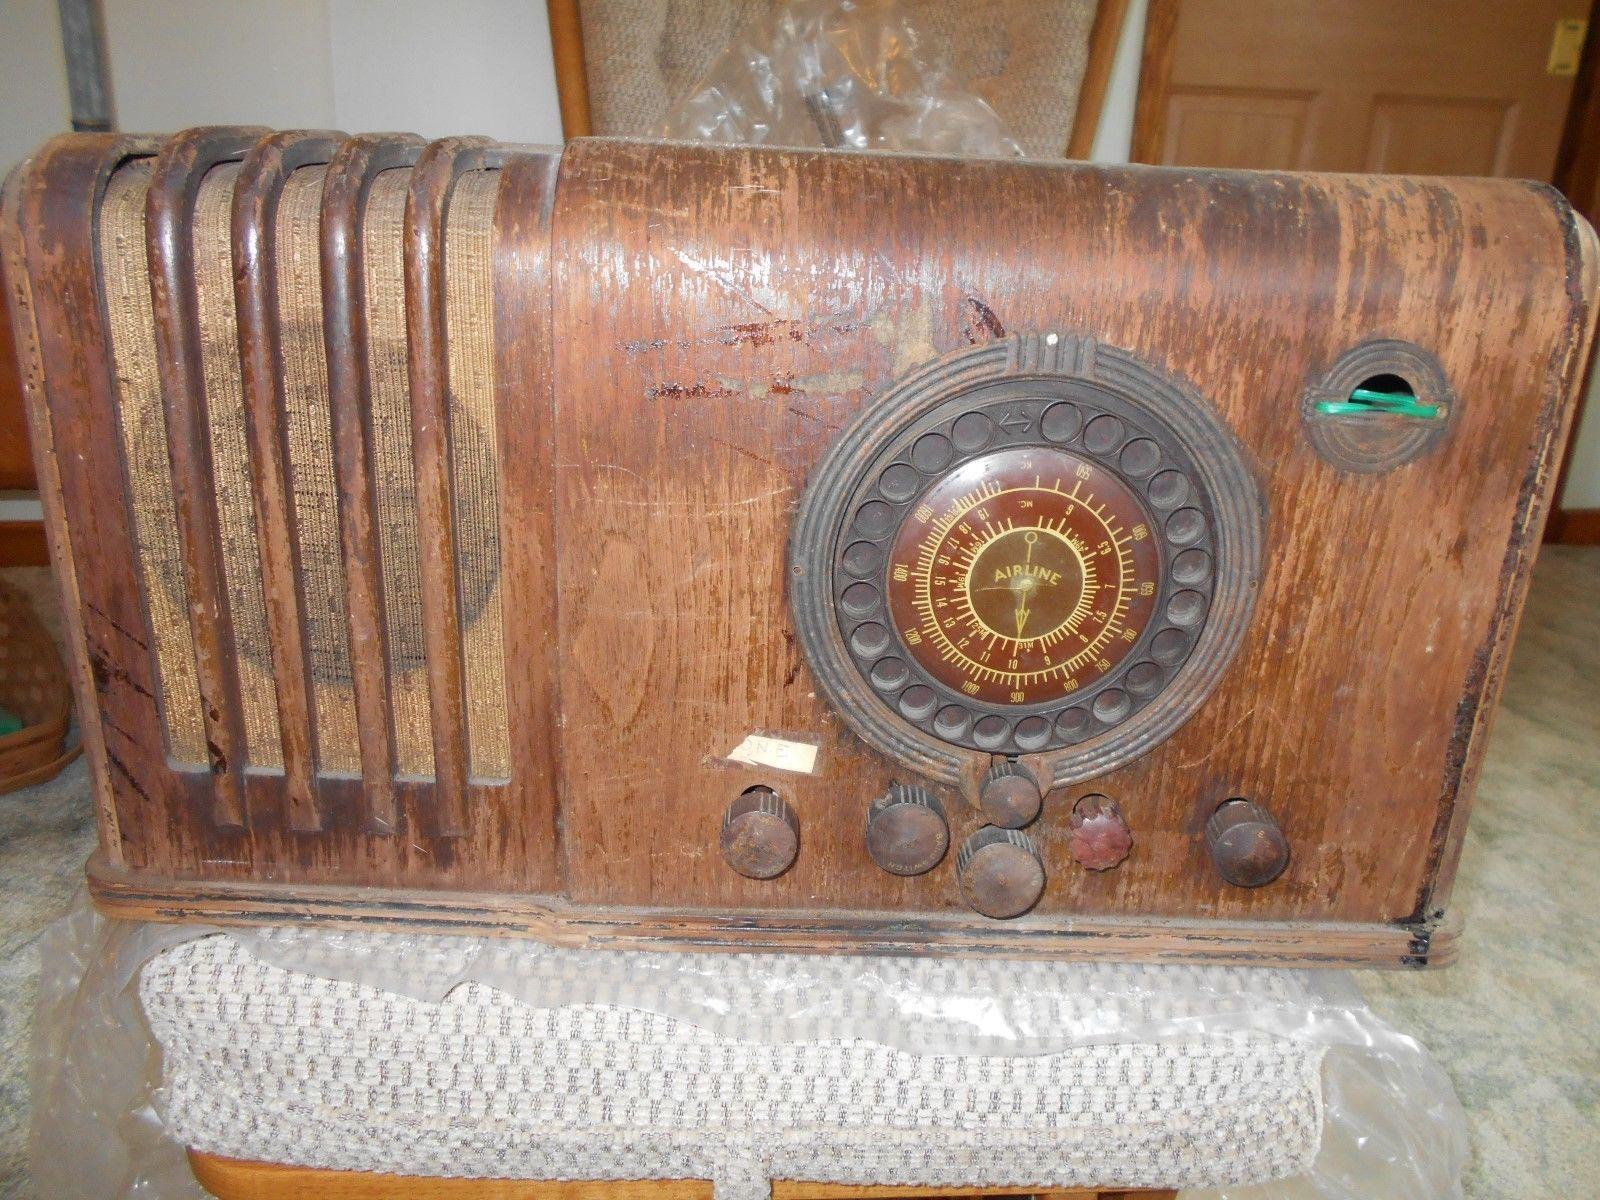 Vintage Wards Airline Radio 7 Tube Standard Short Wave Mod 62 397 Parts Ebay Retro Radios Radio Vintage